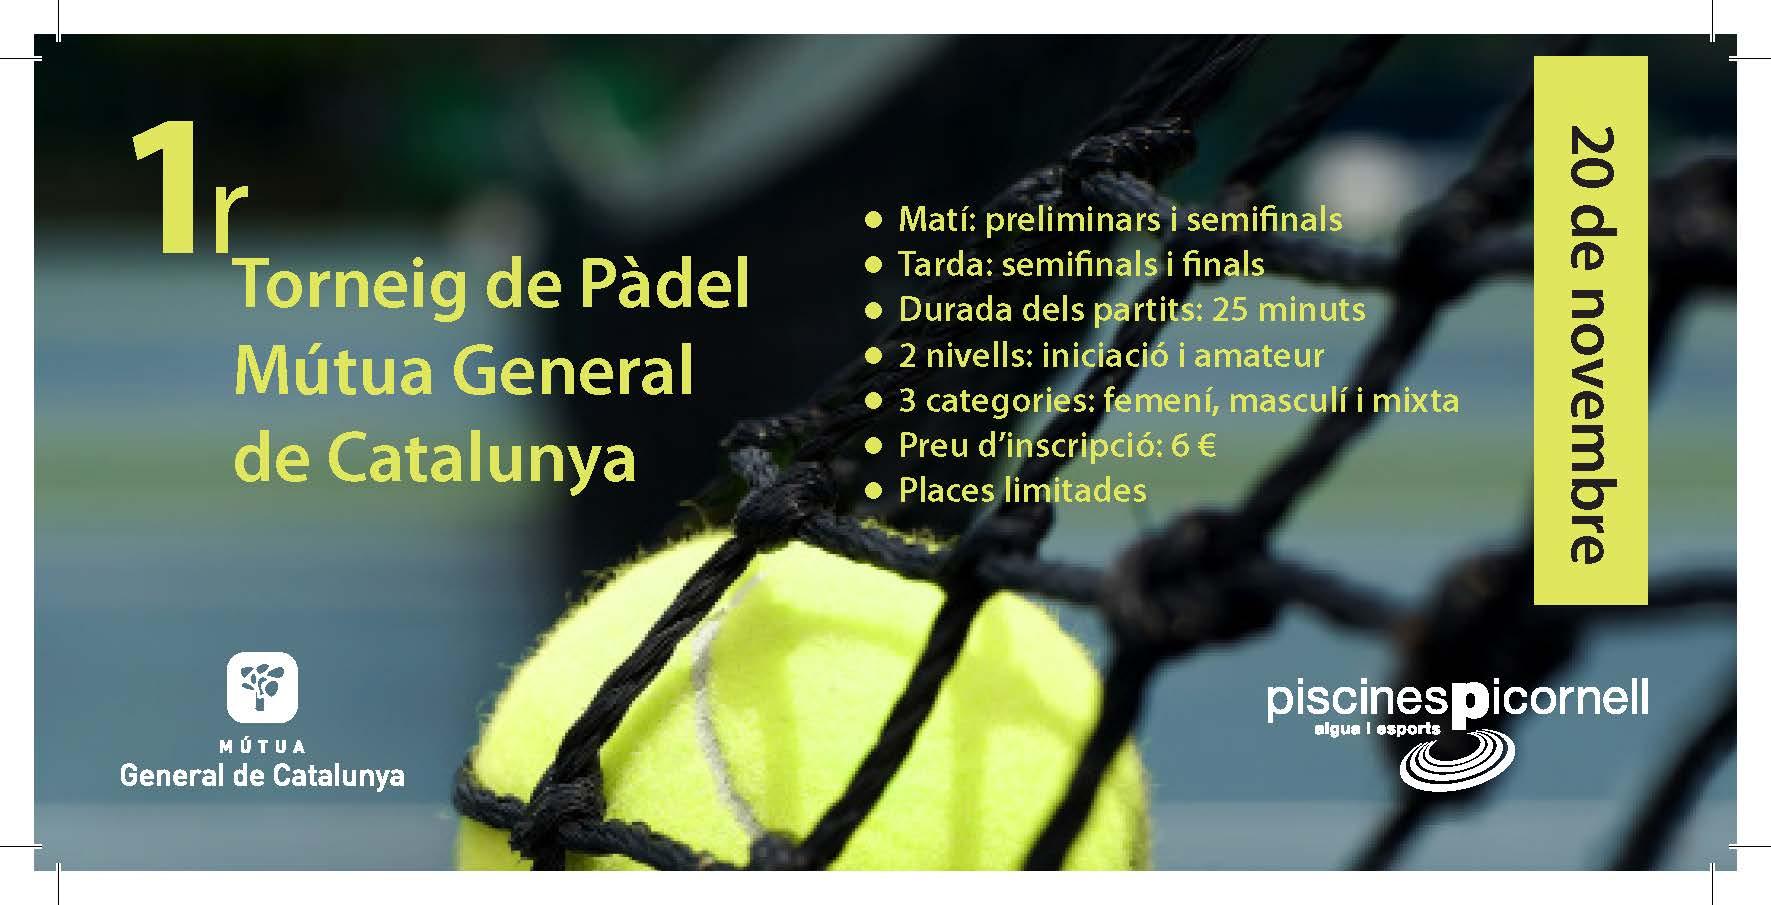 1er Torneo de Pádel Mútua General de Catalunya en las Piscinas Picornell